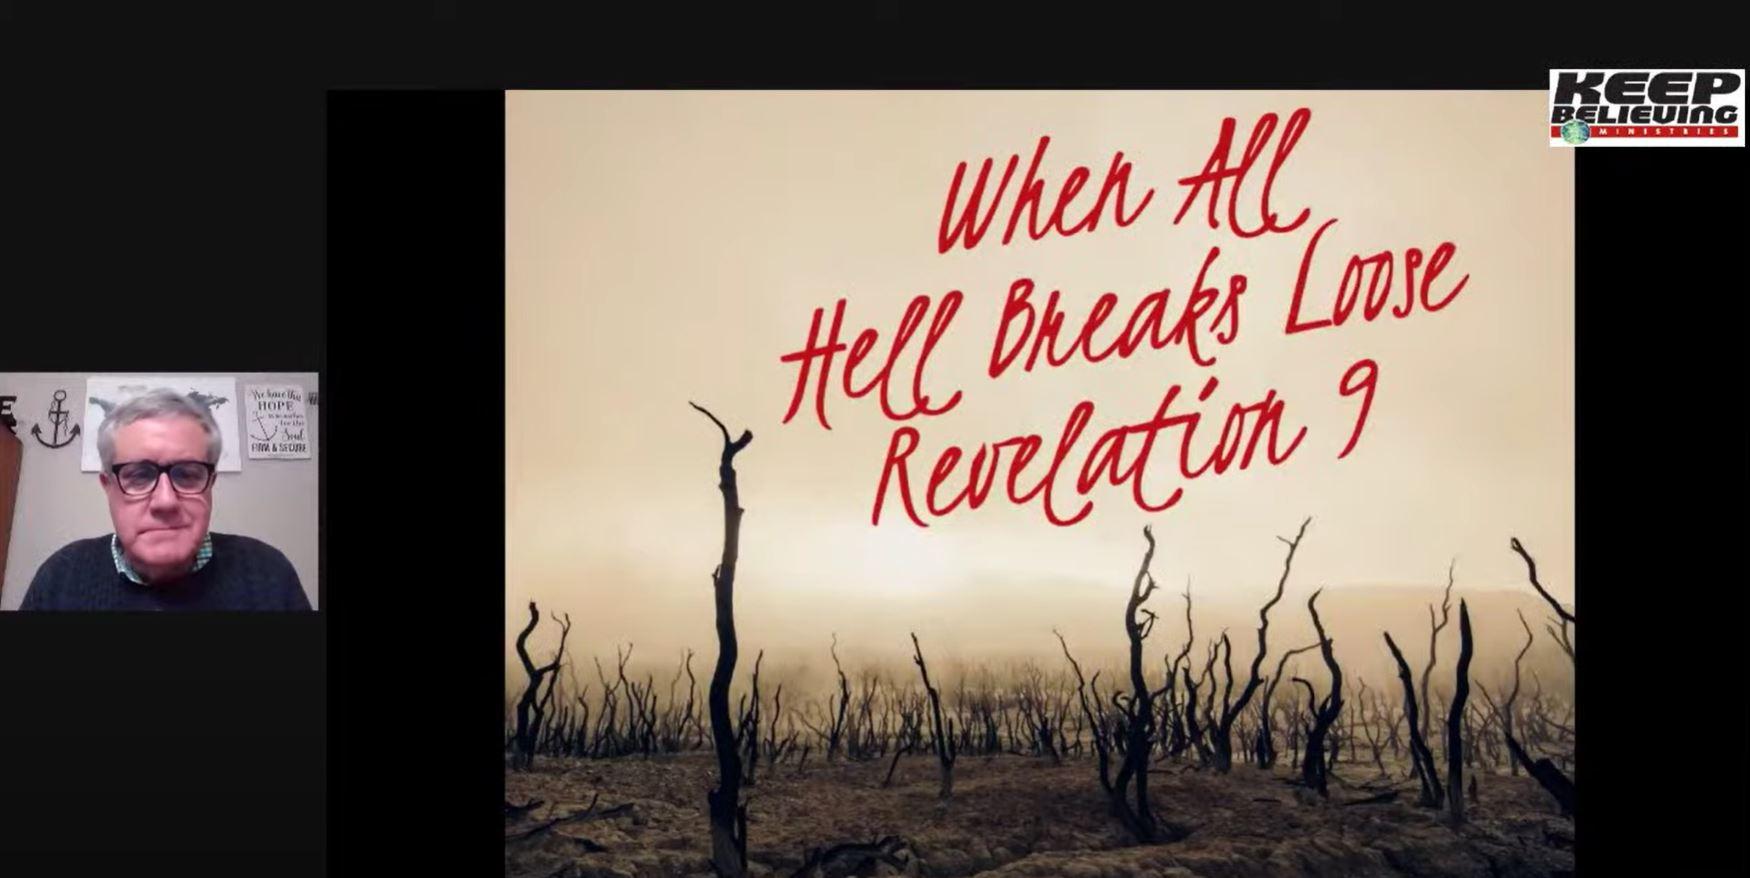 When All Hell Breaks Loose (Revelation 9)